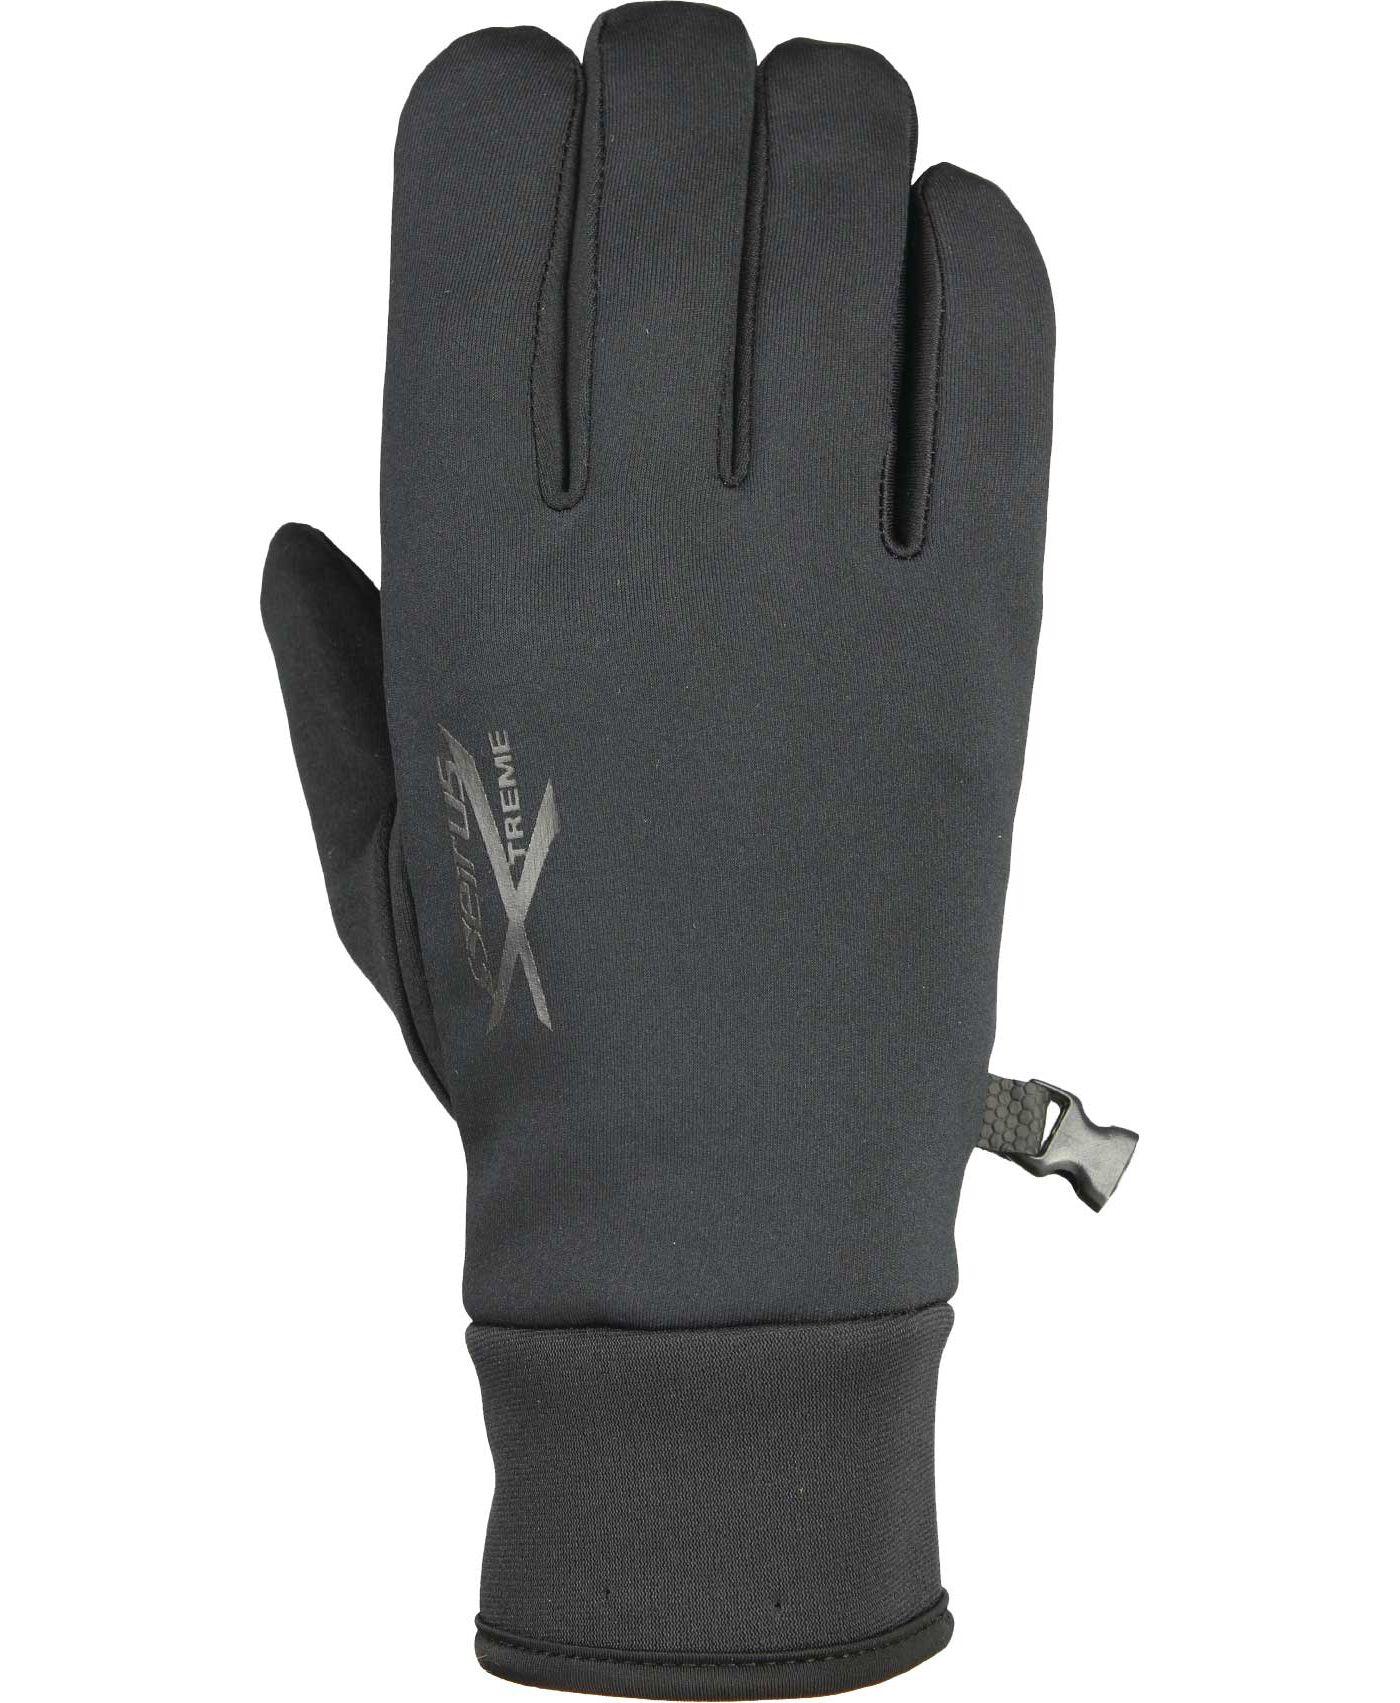 Seirus Men's Xtreme All Weather Glove